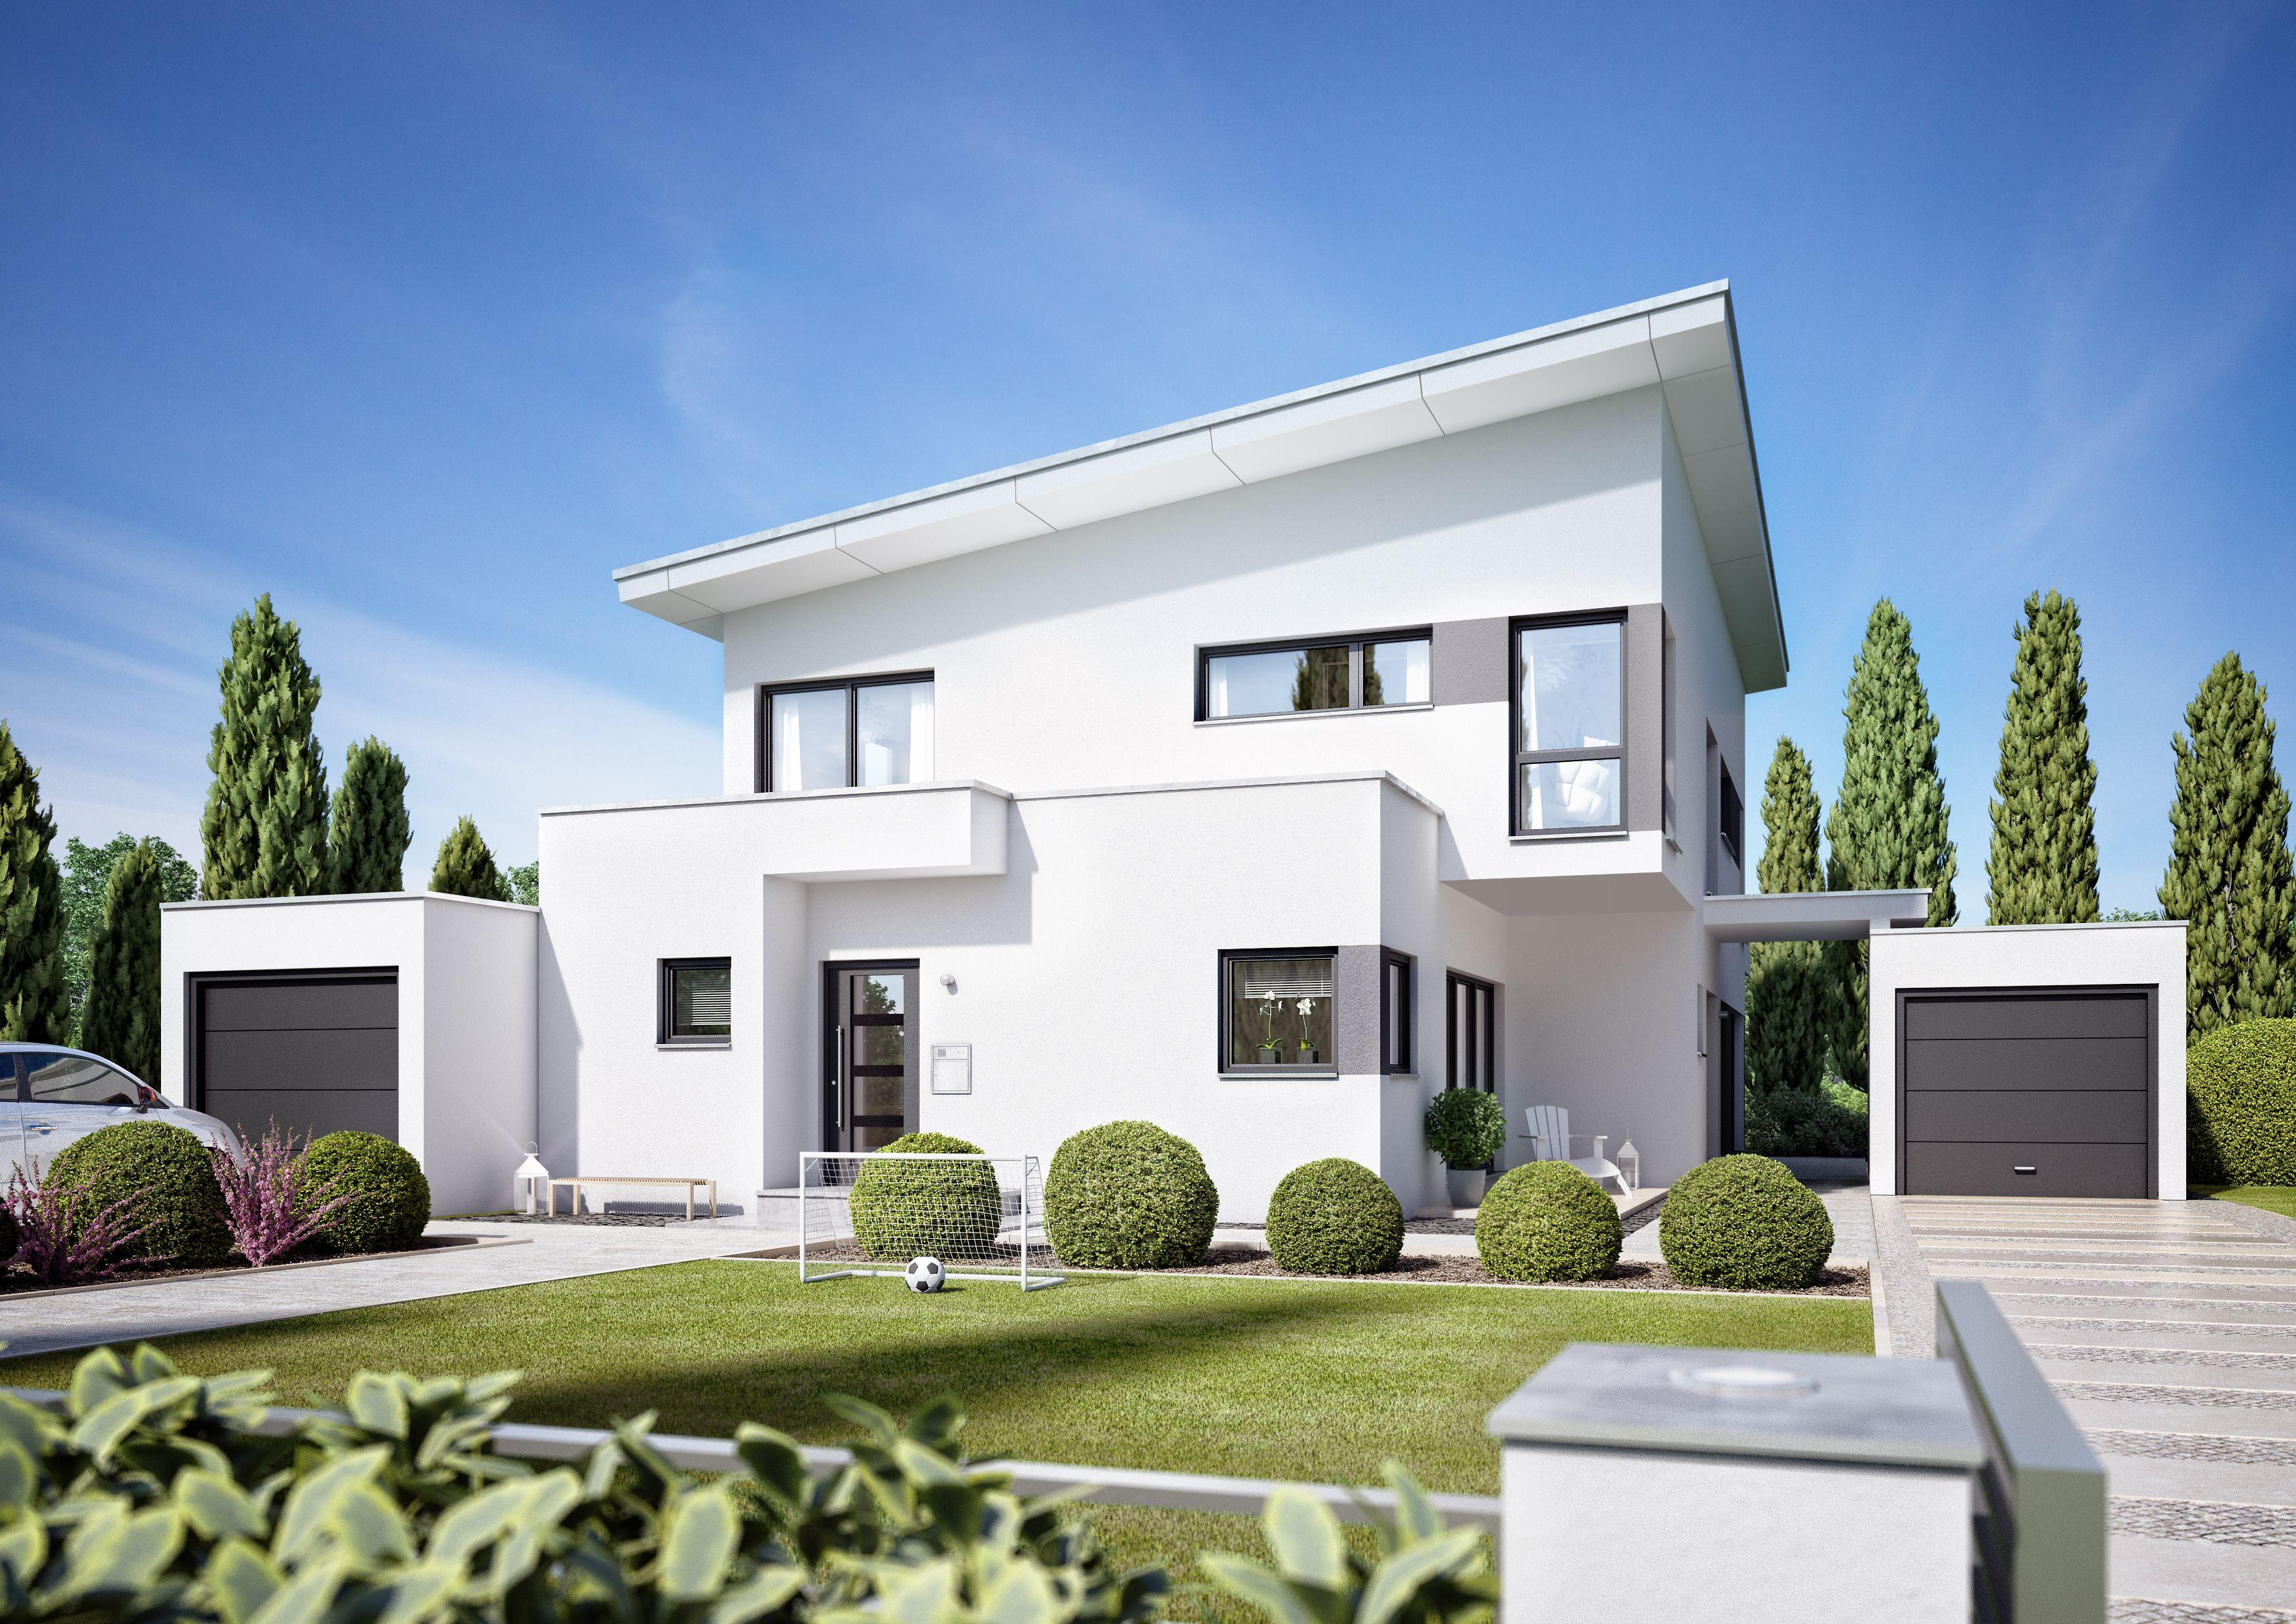 architekten haus corradino elegante familienvilla mit. Black Bedroom Furniture Sets. Home Design Ideas